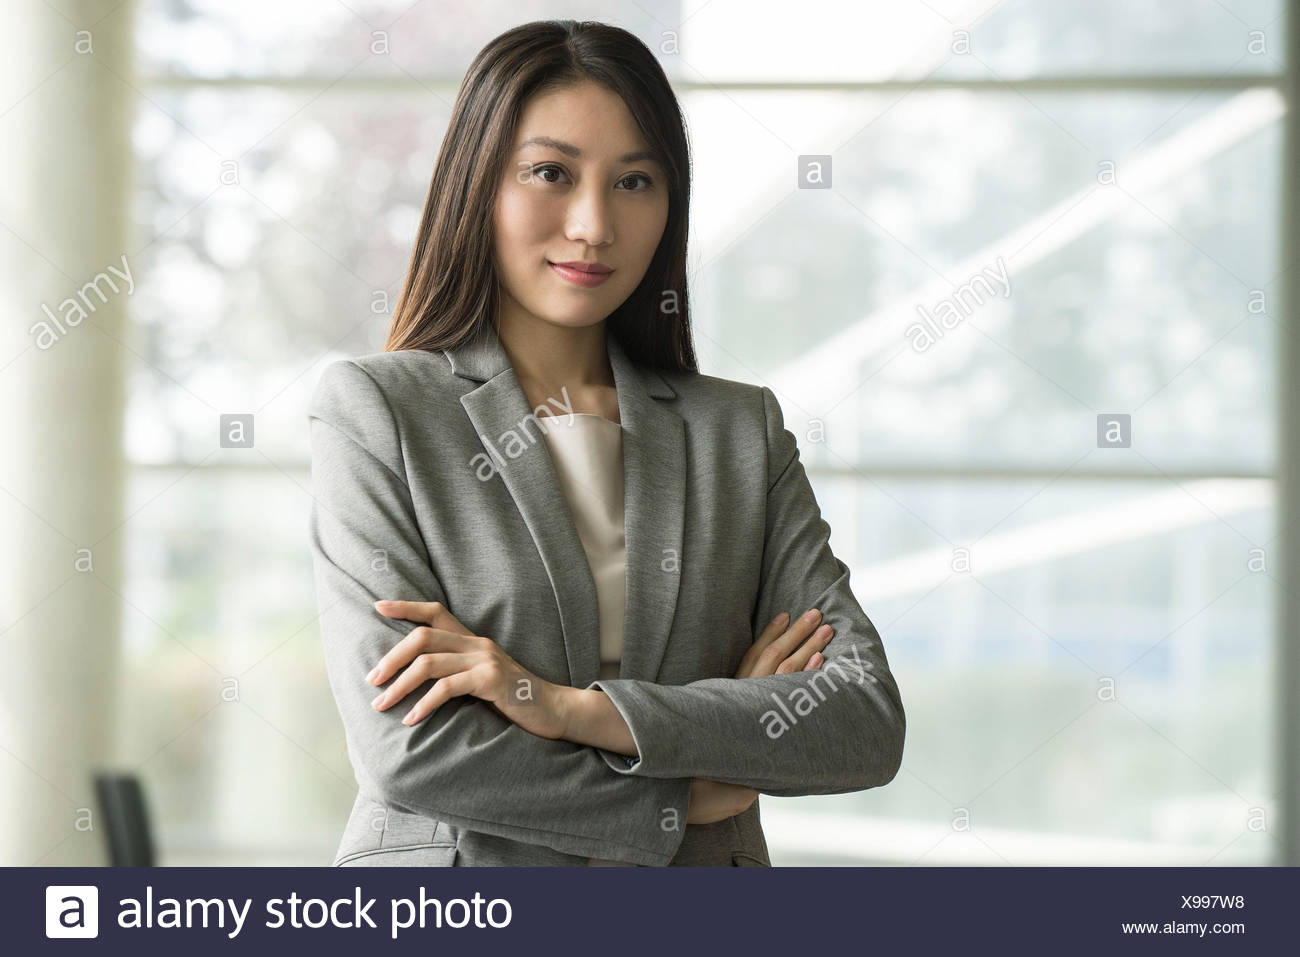 Business CEO, portrait - Stock Image